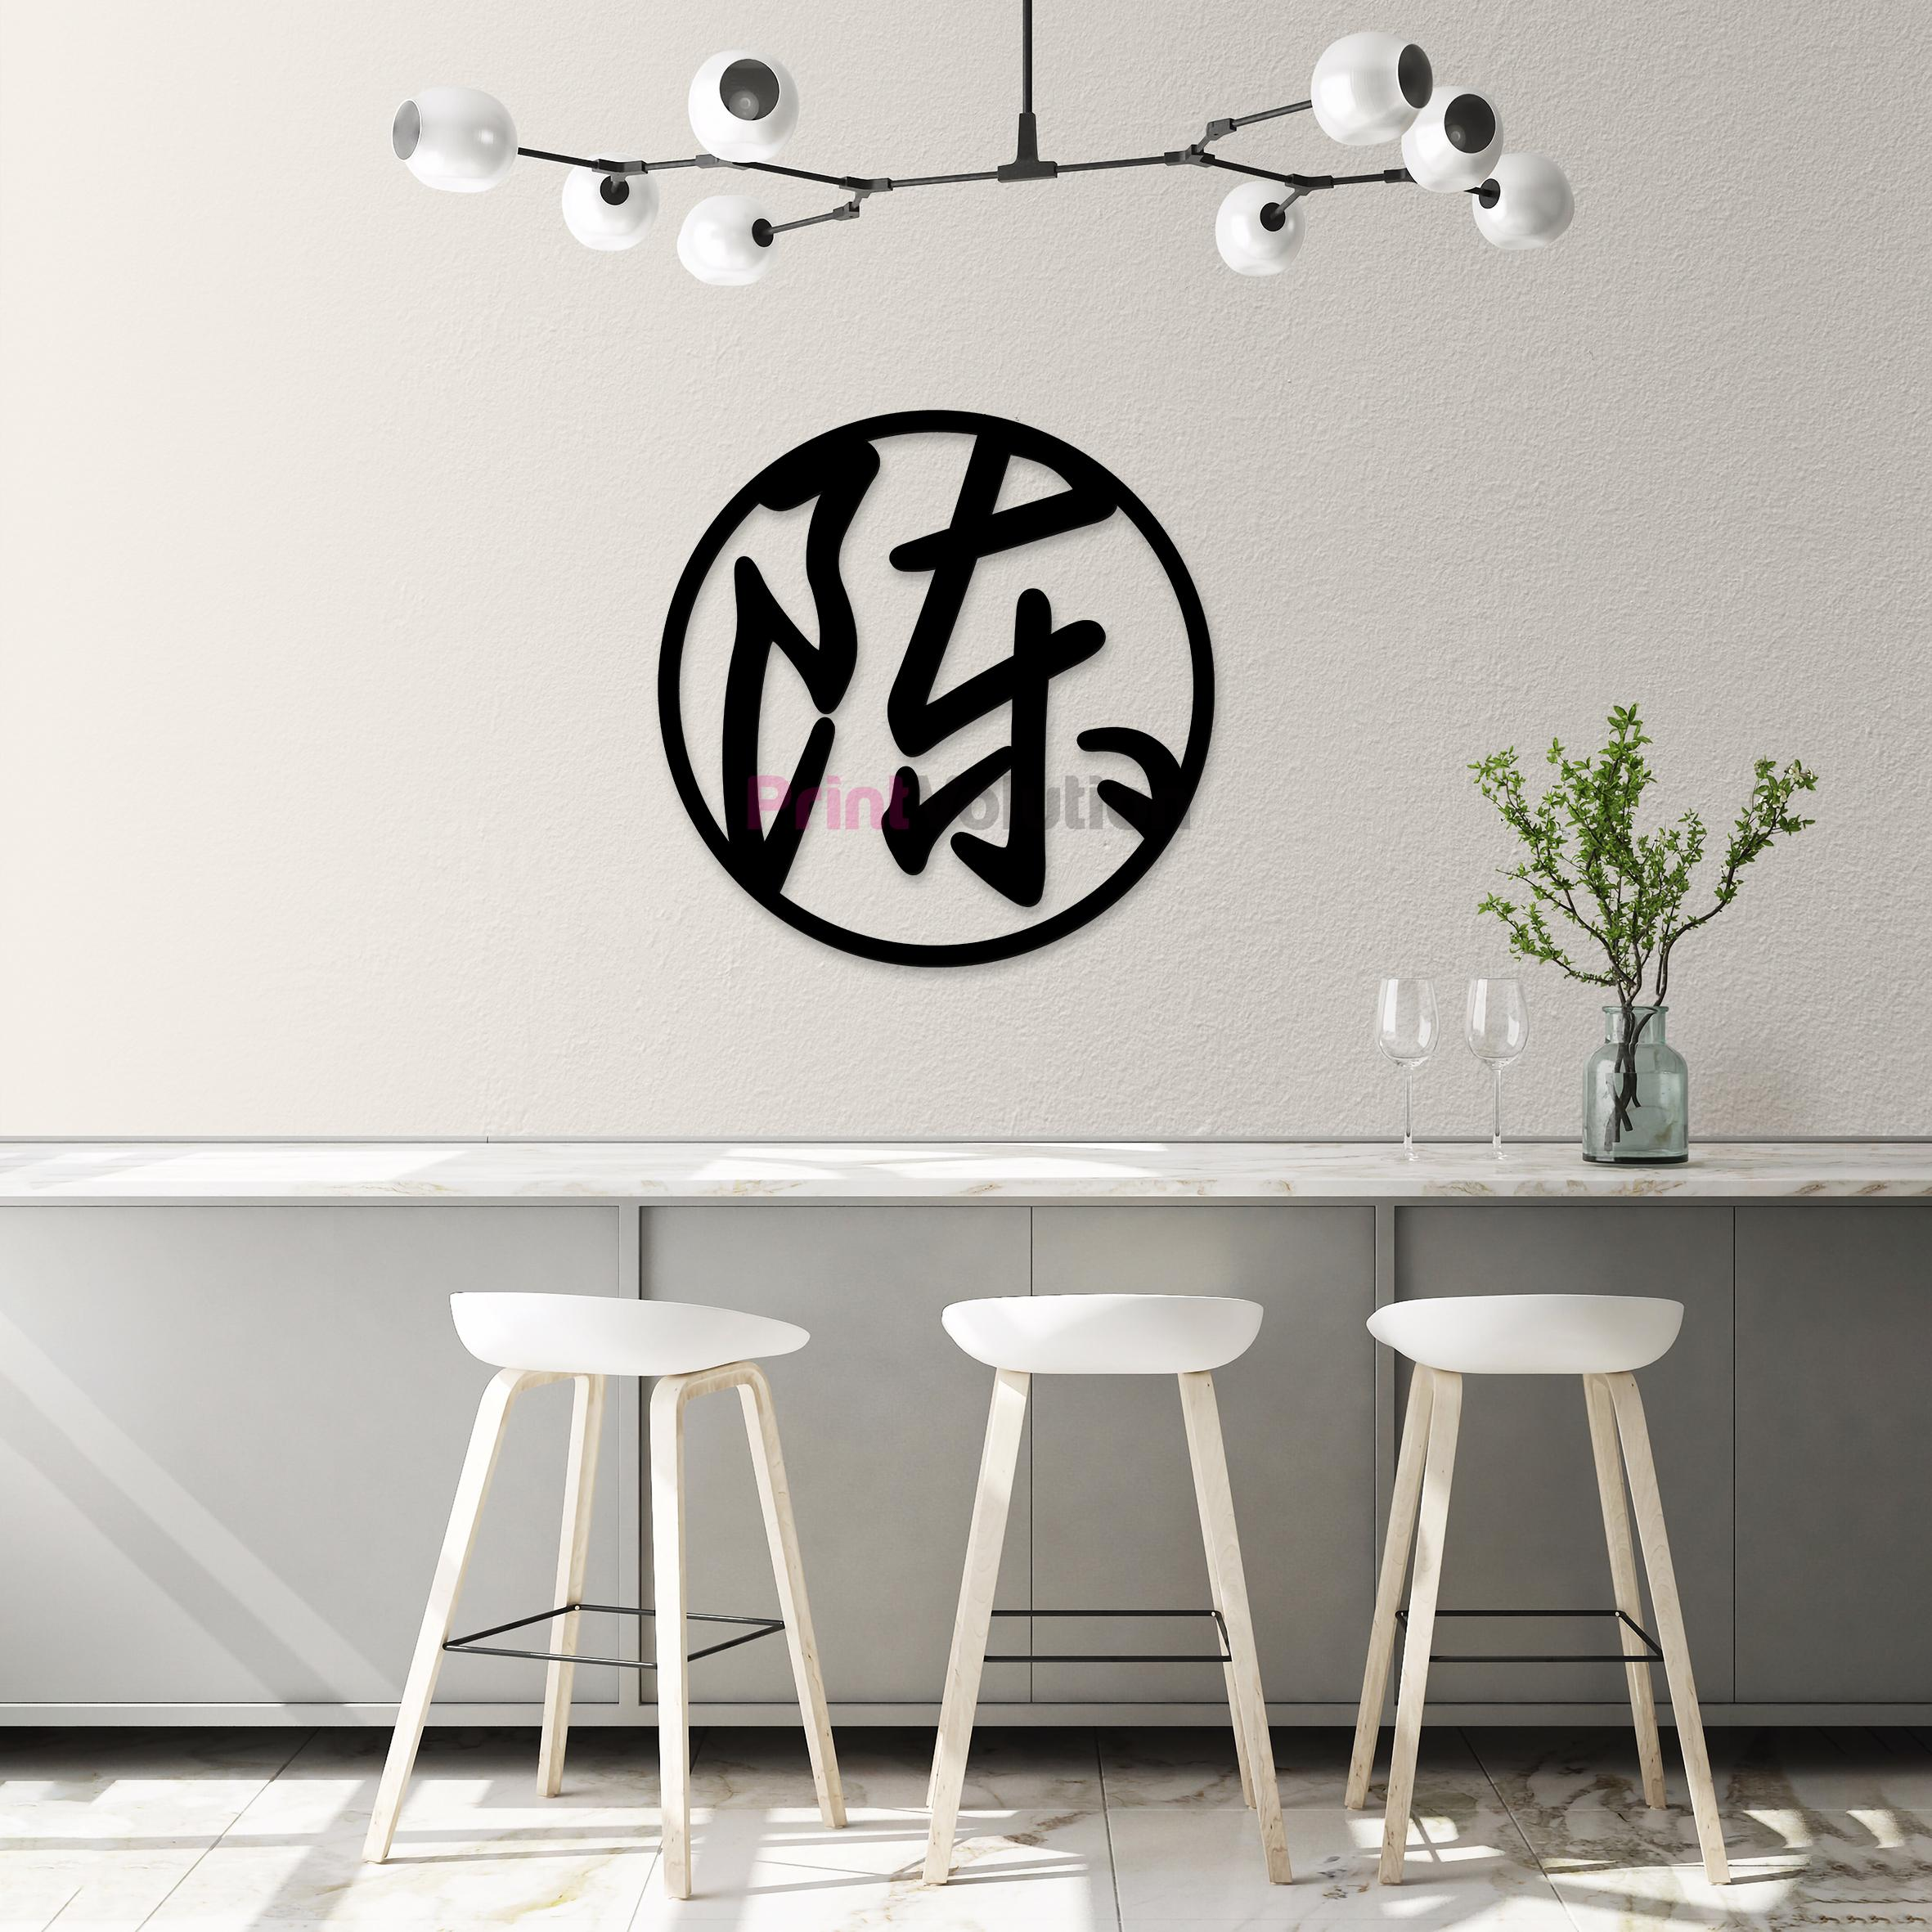 Chen Family Wall Art Signage - Black Acrylic